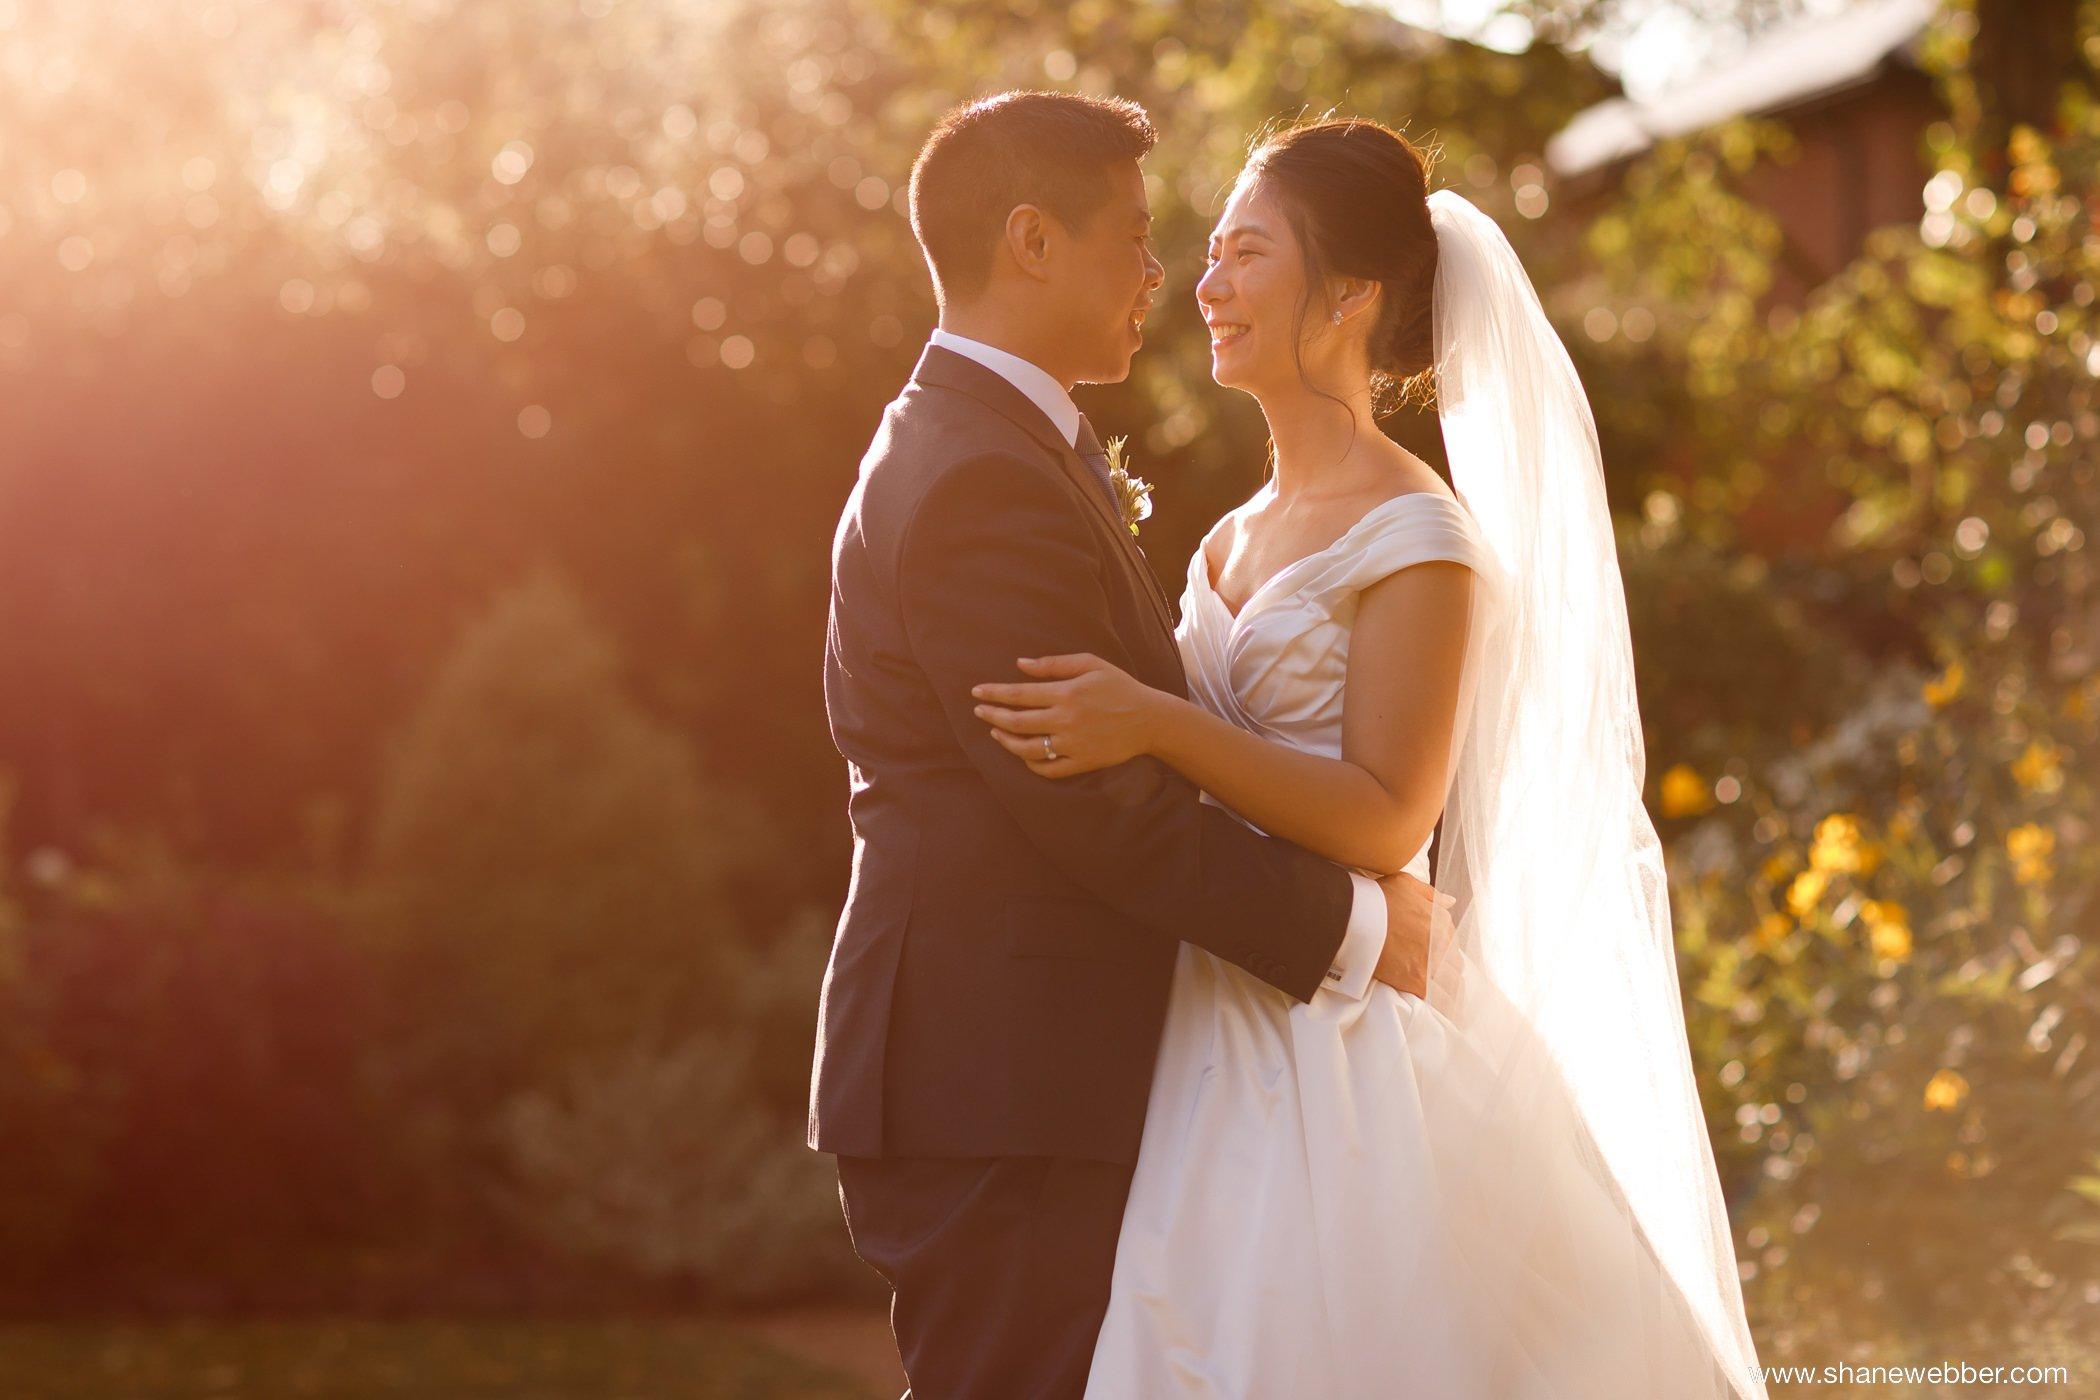 Didsbury House hotel wedding photography